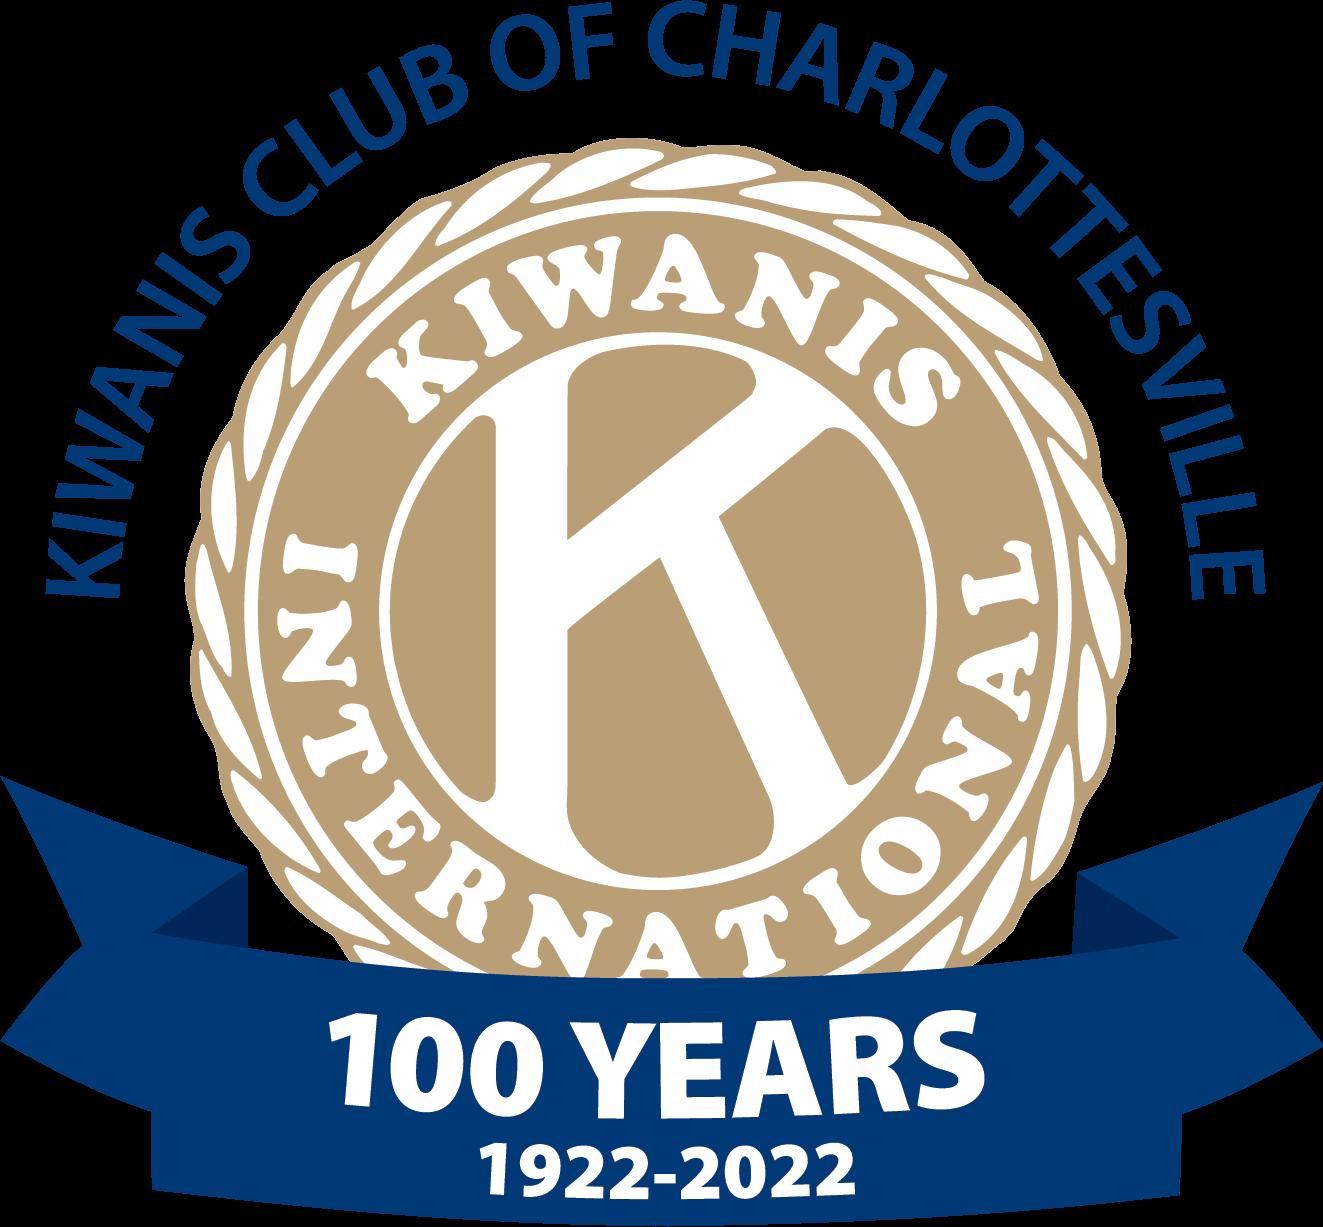 Kiwanis Club of Charlottesville